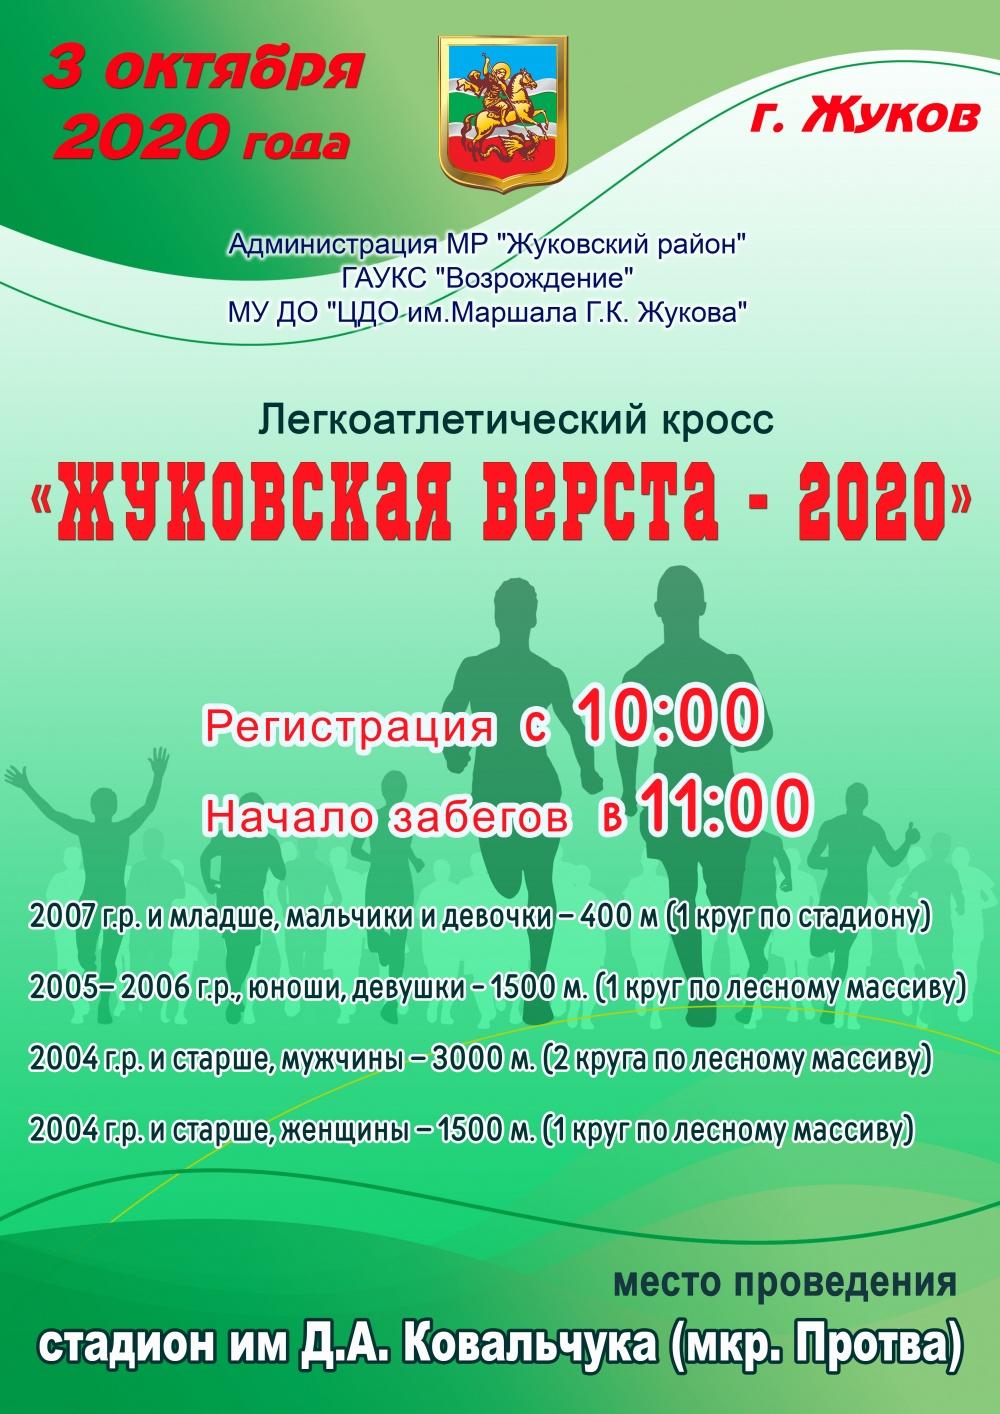 Жуковская верста - 2020г